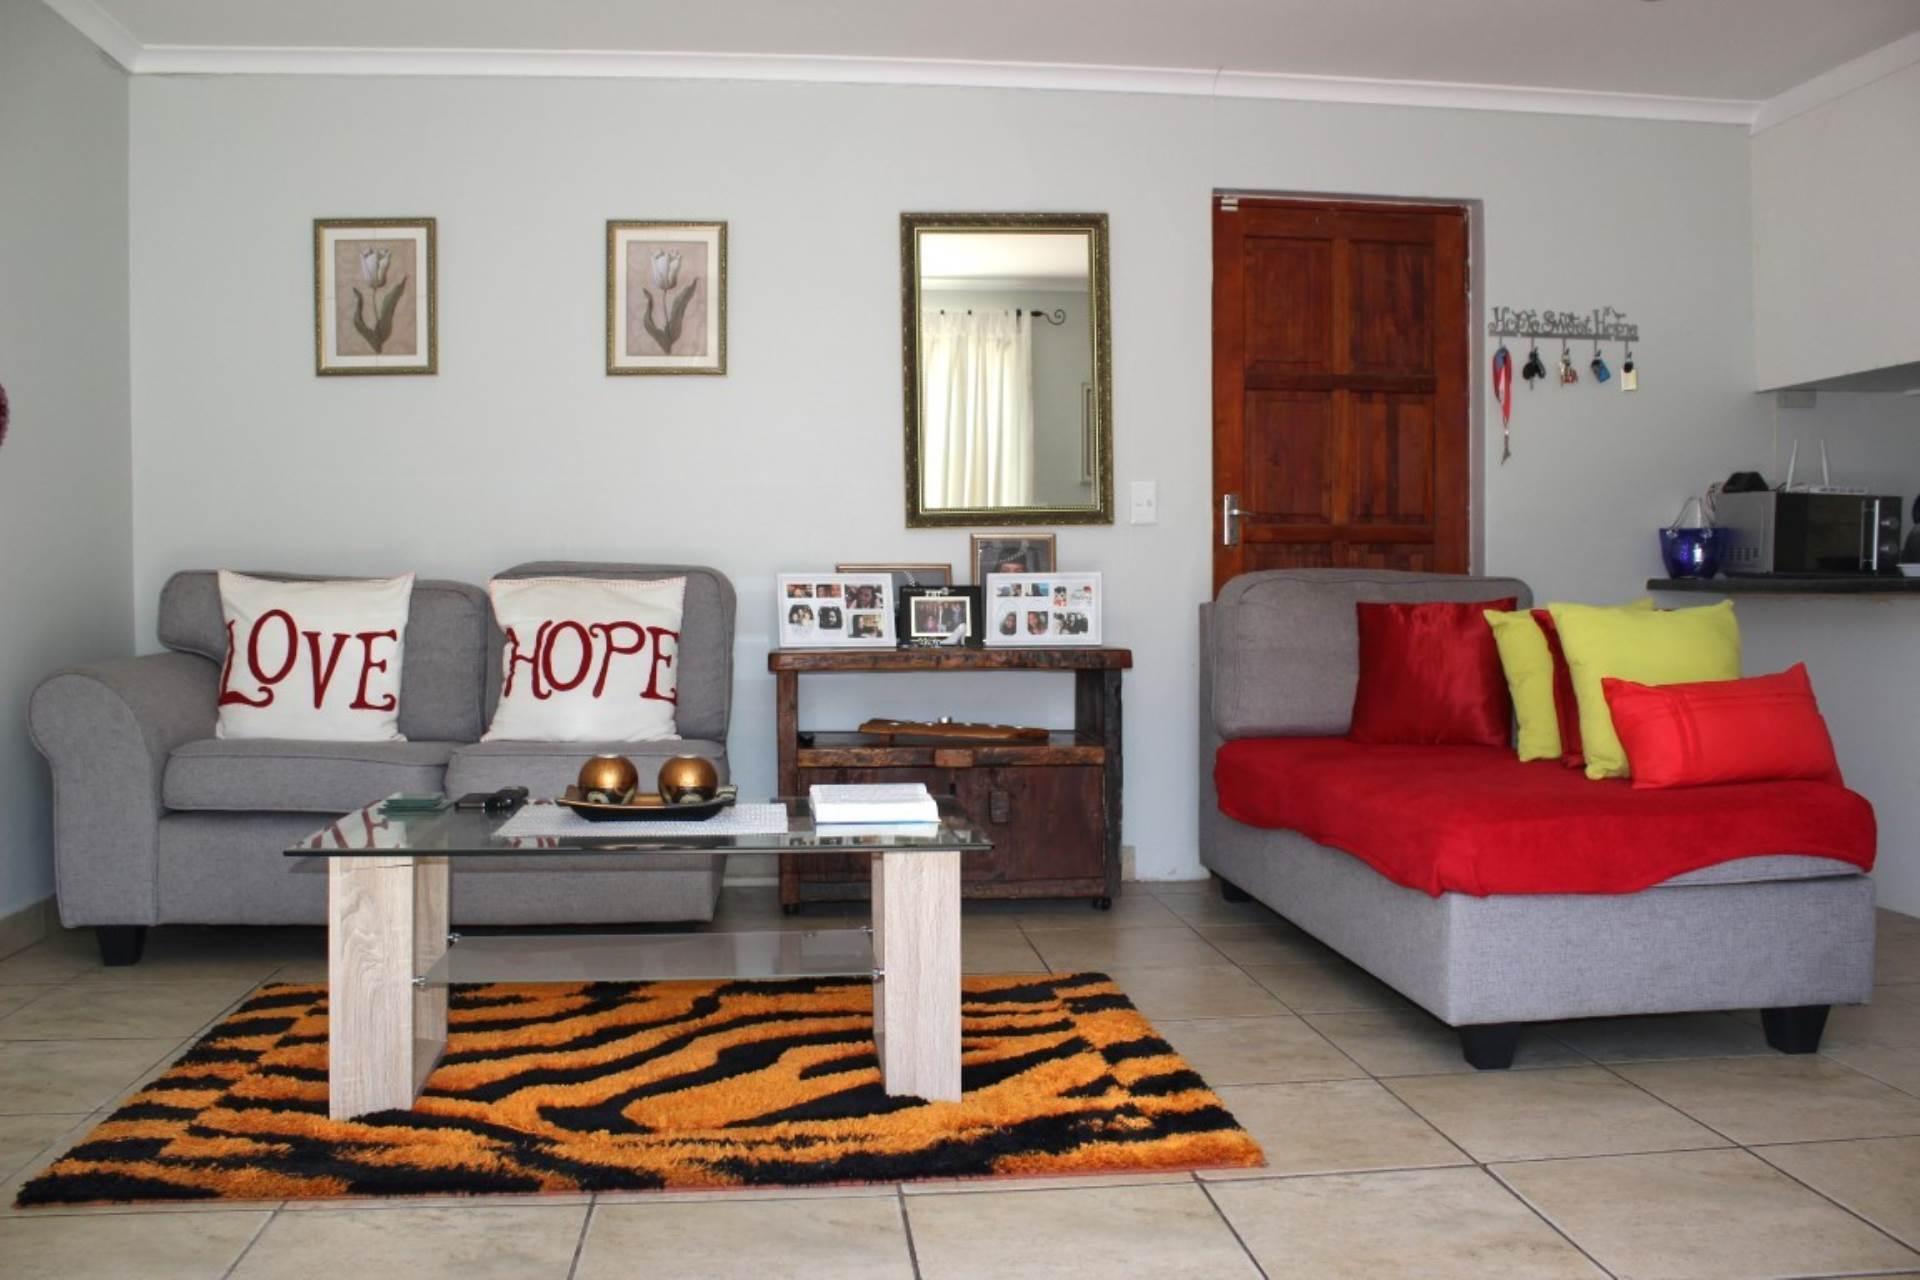 5 BedroomHouse For Sale In Phoenix